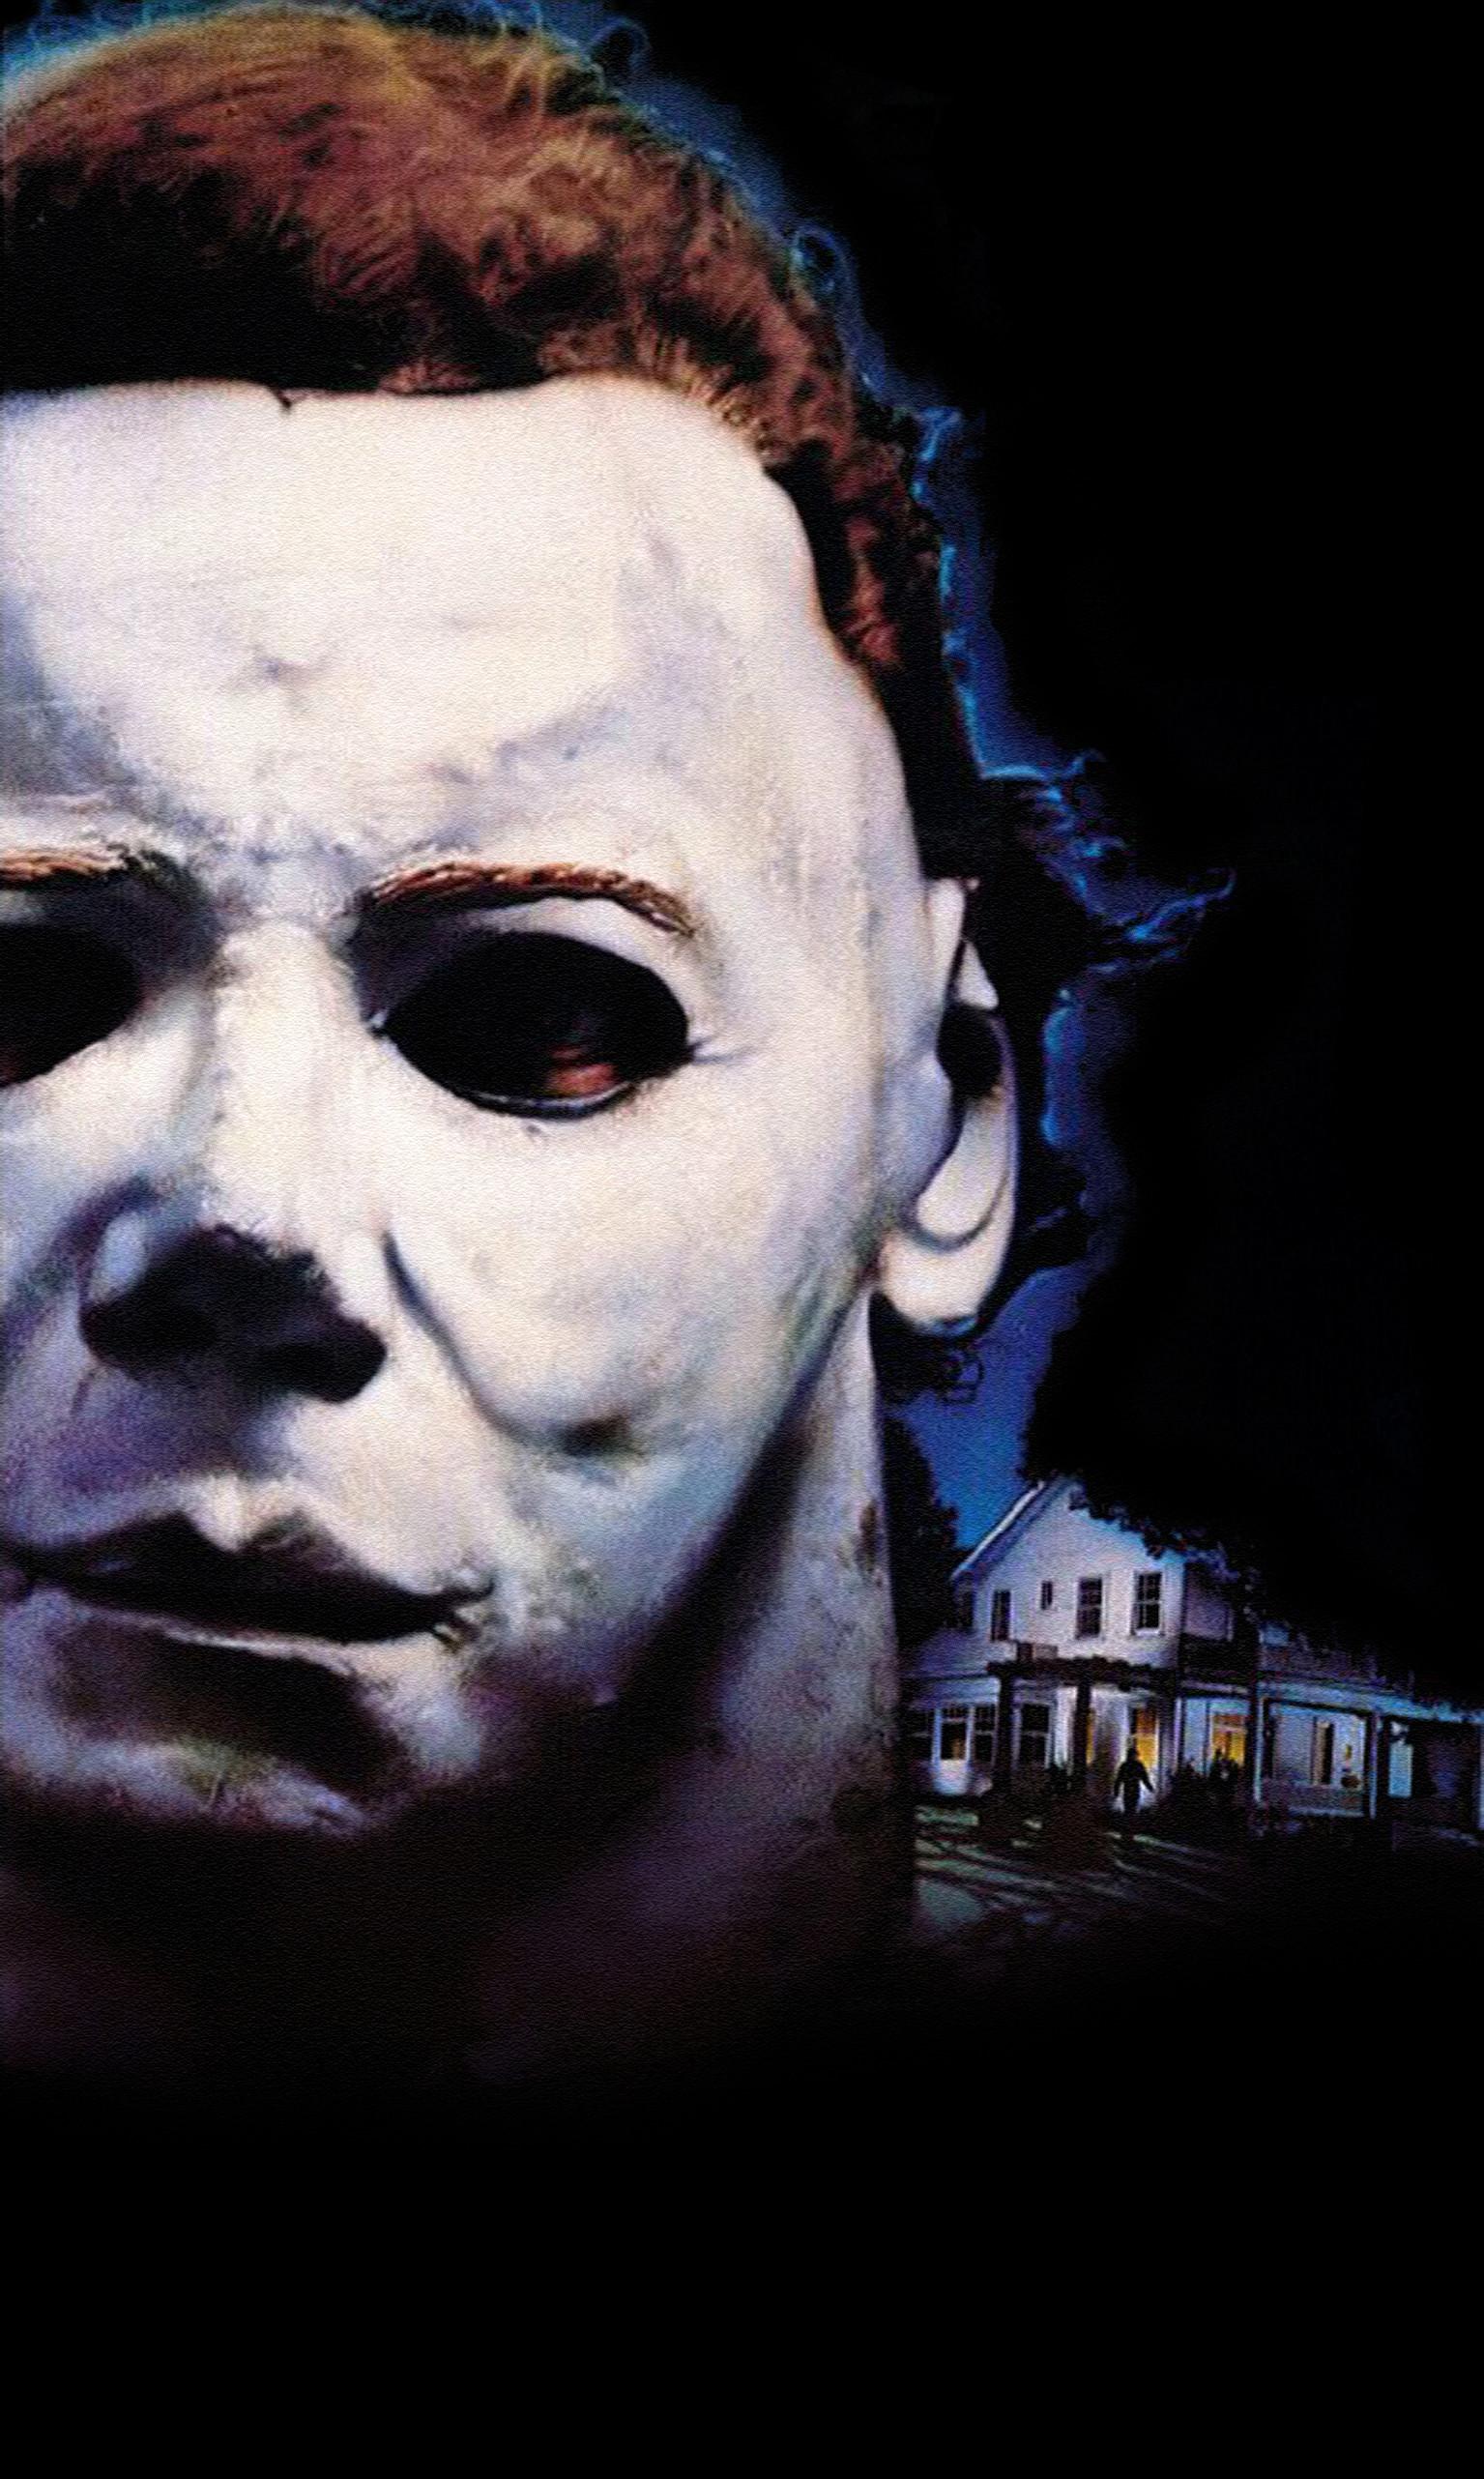 Freddy Krueger Wallpaper 3d Halloween 4 The Return Of Michael Myers Images Halloween